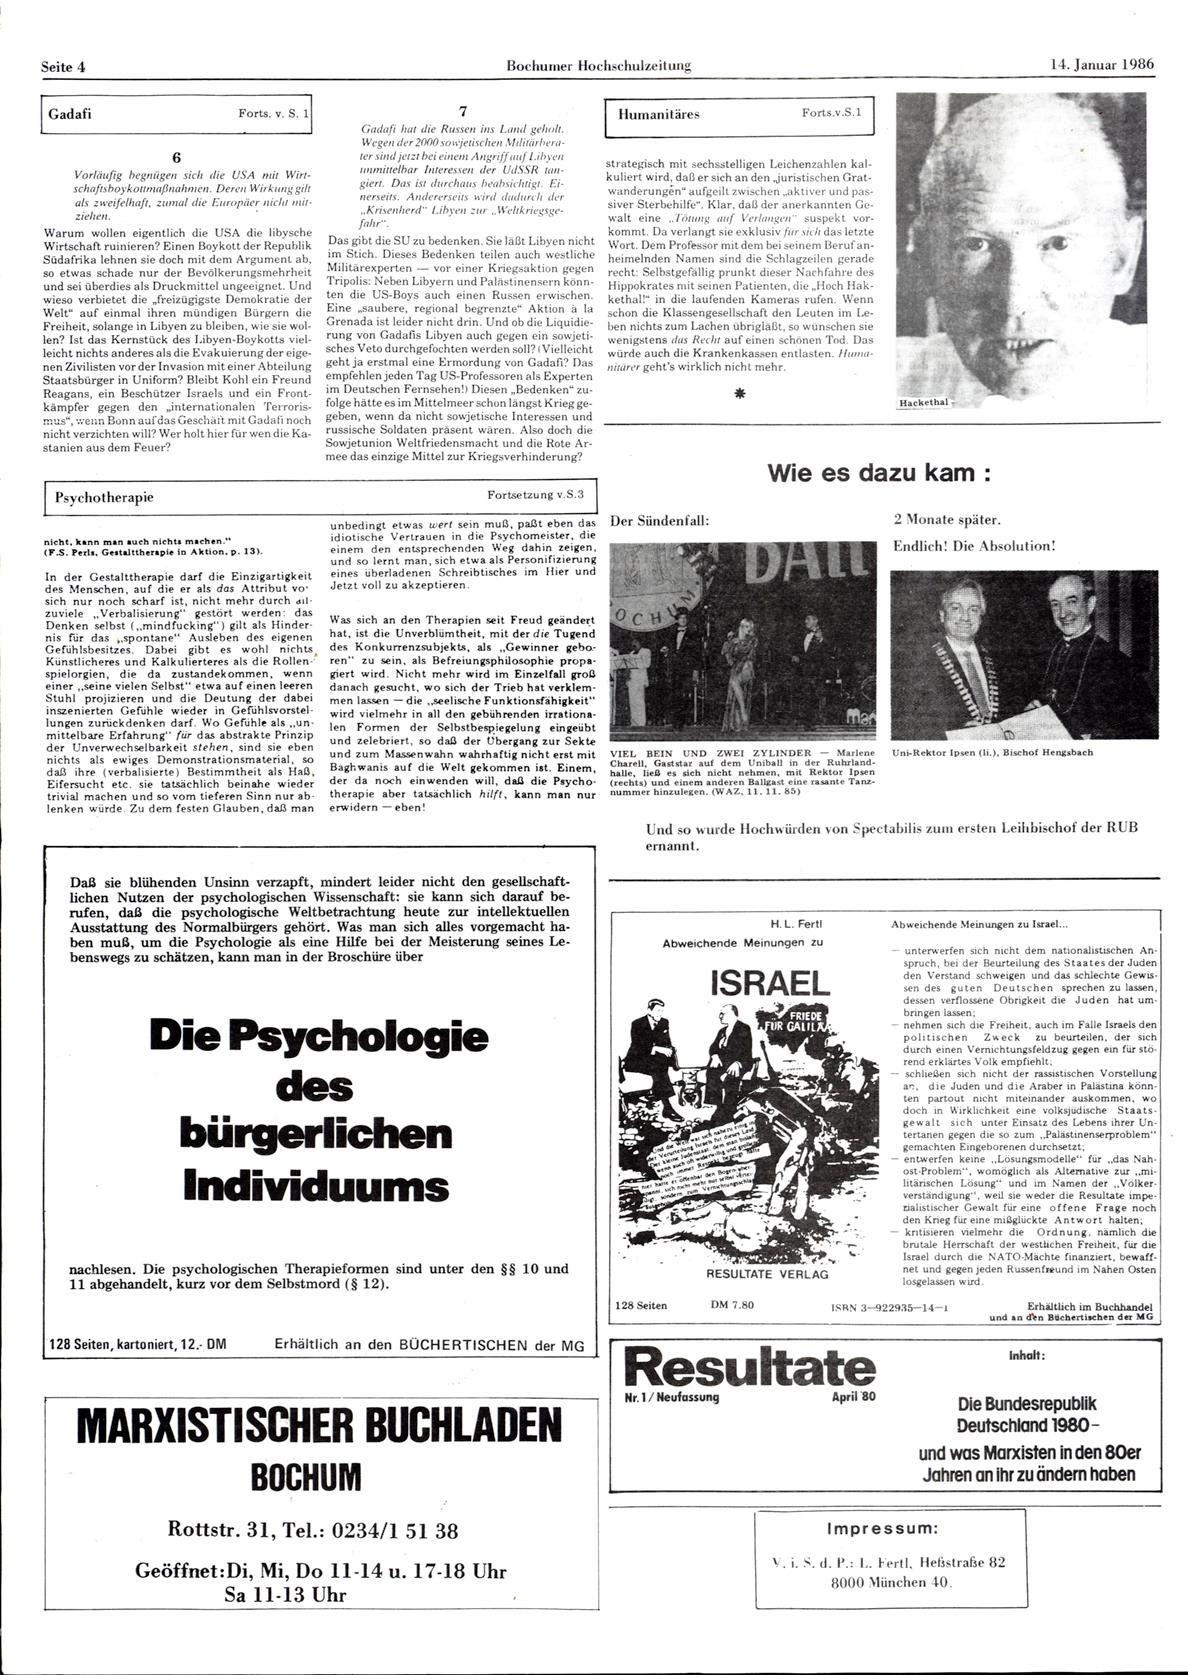 Bochum_BHZ_19860114_123_004